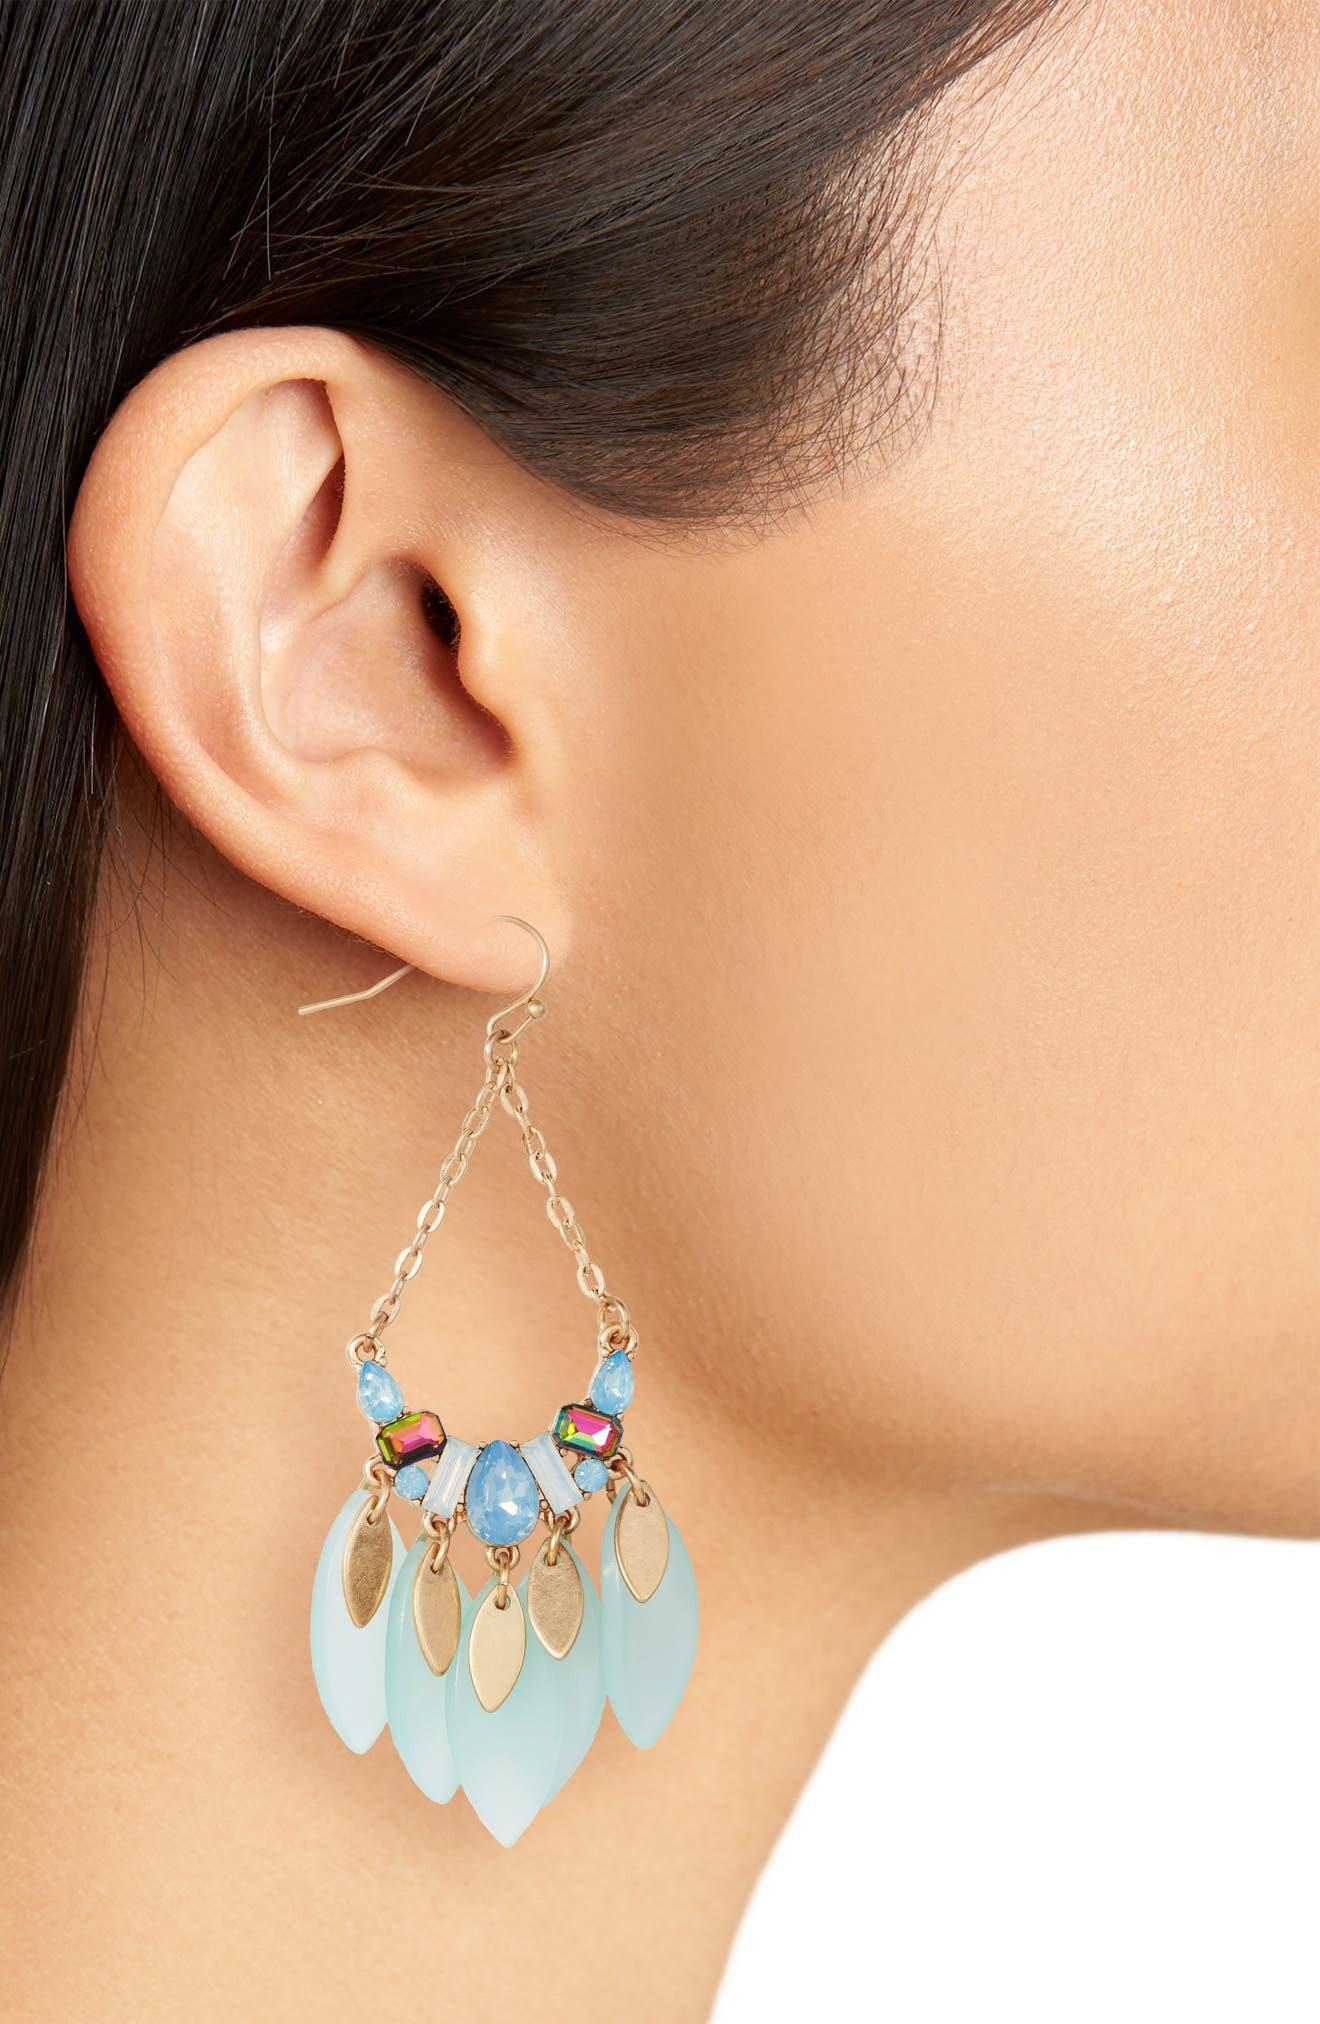 Petal Teardrop Earrings,                             Alternate thumbnail 2, color,                             450